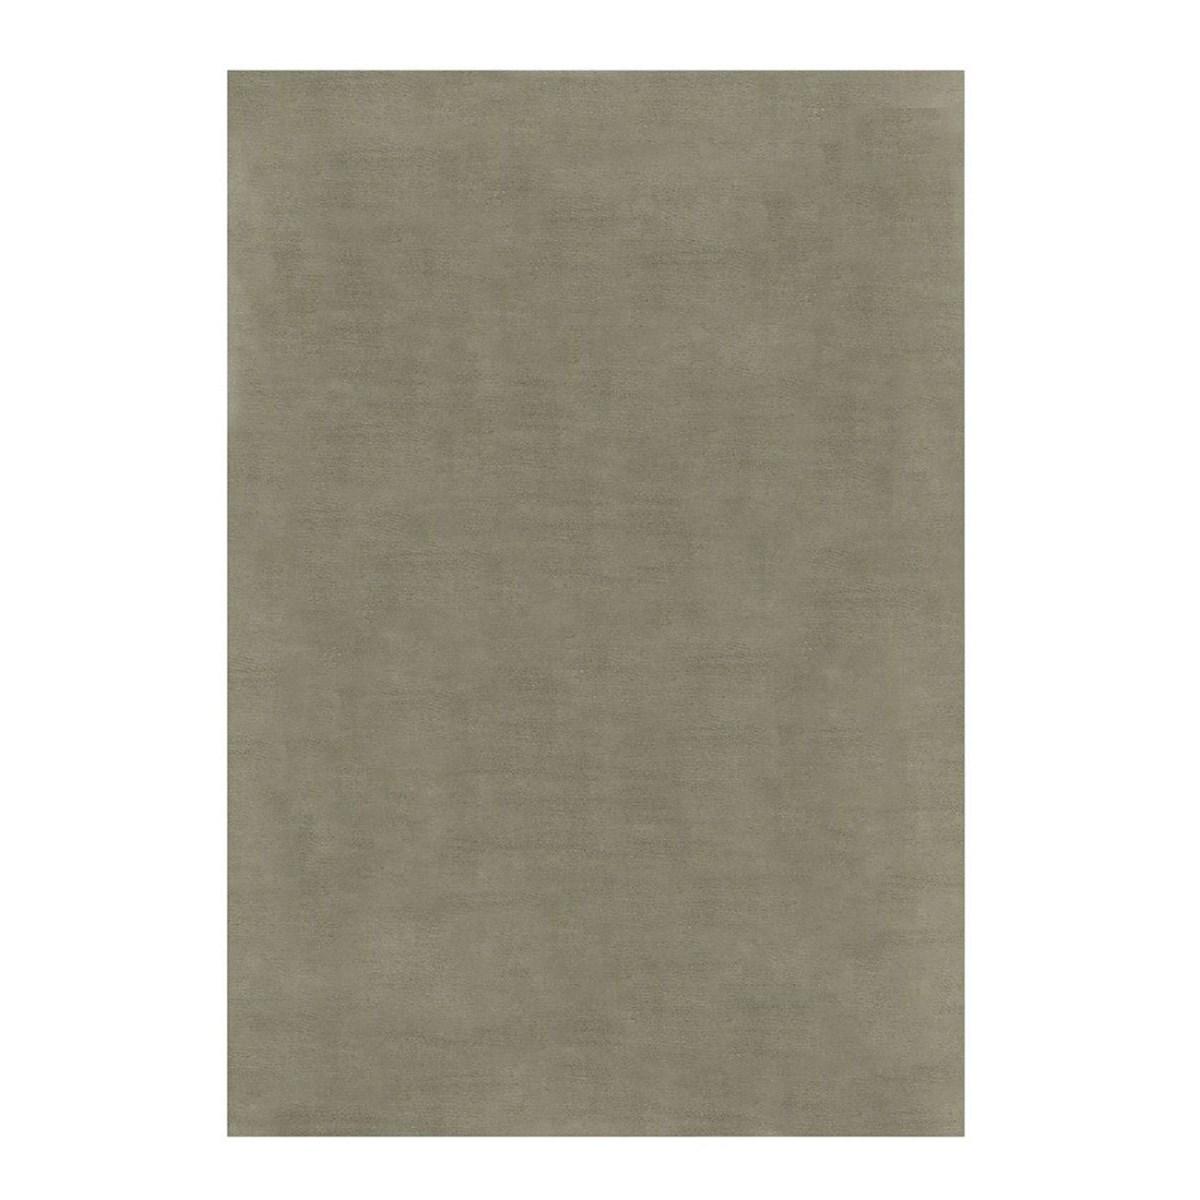 Tapis de salon moderne en Polyester Gris 160x230 cm